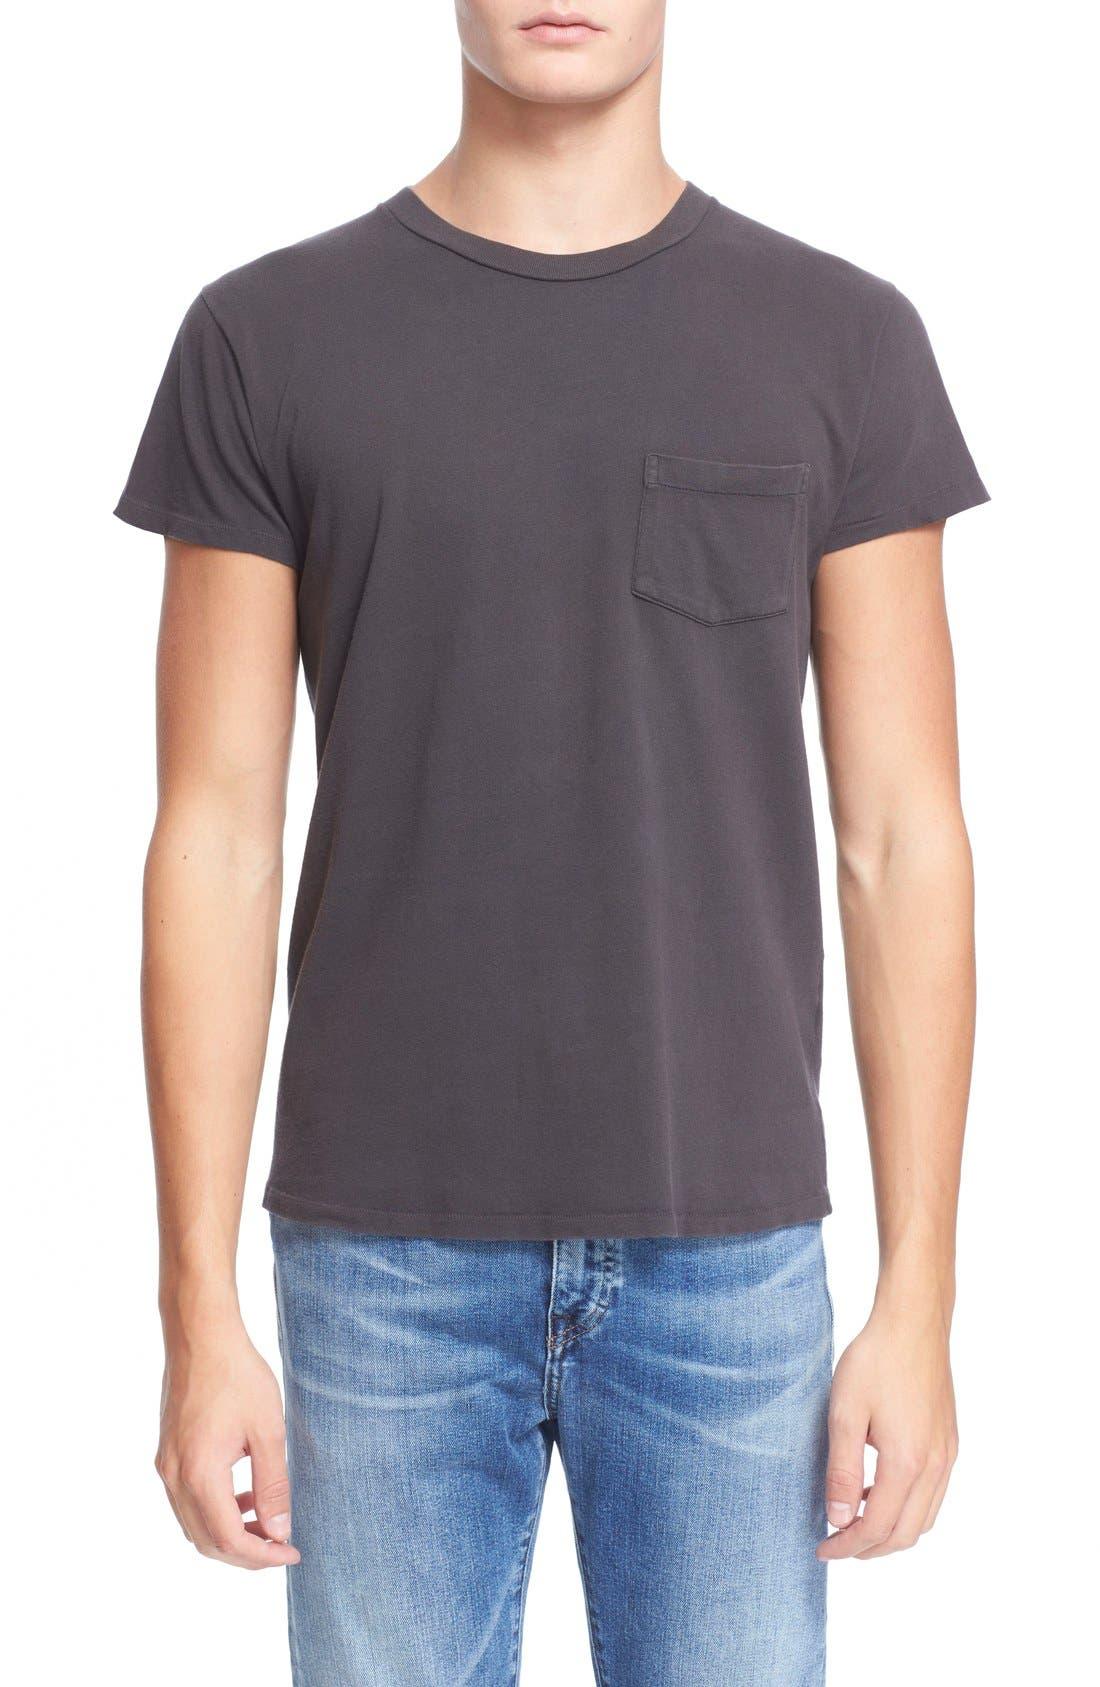 Levi's Vintage Clothing '1950s' Pocket T-Shirt,                         Main,                         color, Black